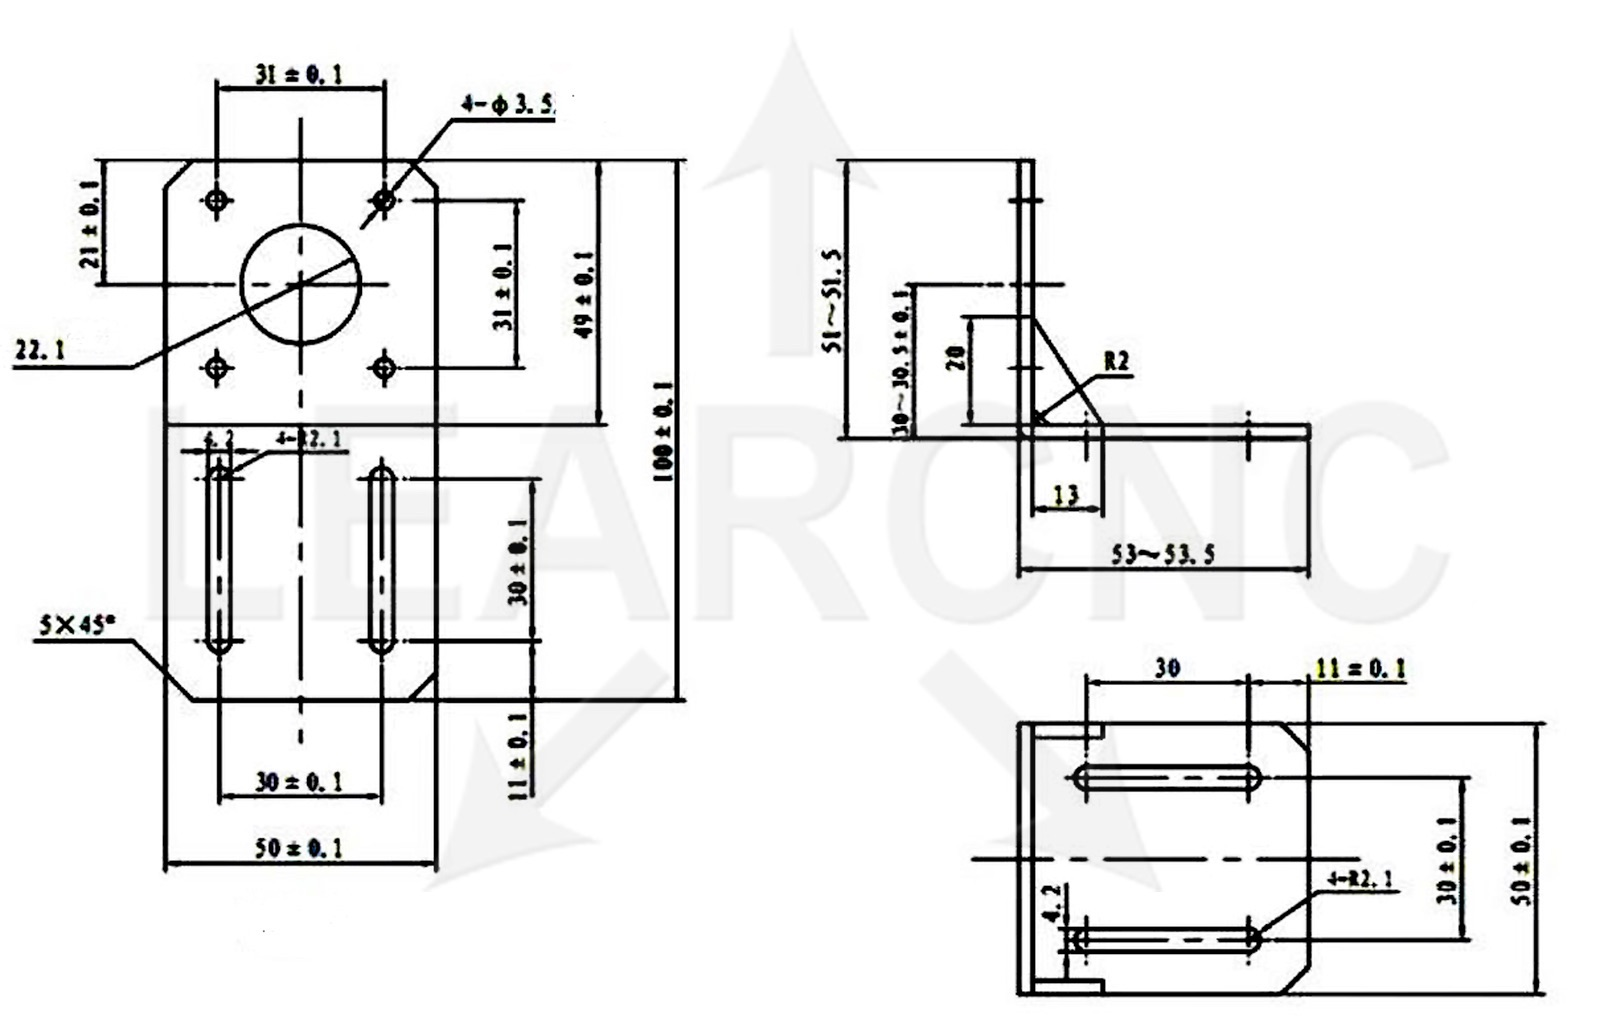 Nema17 Stepper Motor Mount Bracket Reprap Cnc Ramps 3d Printer